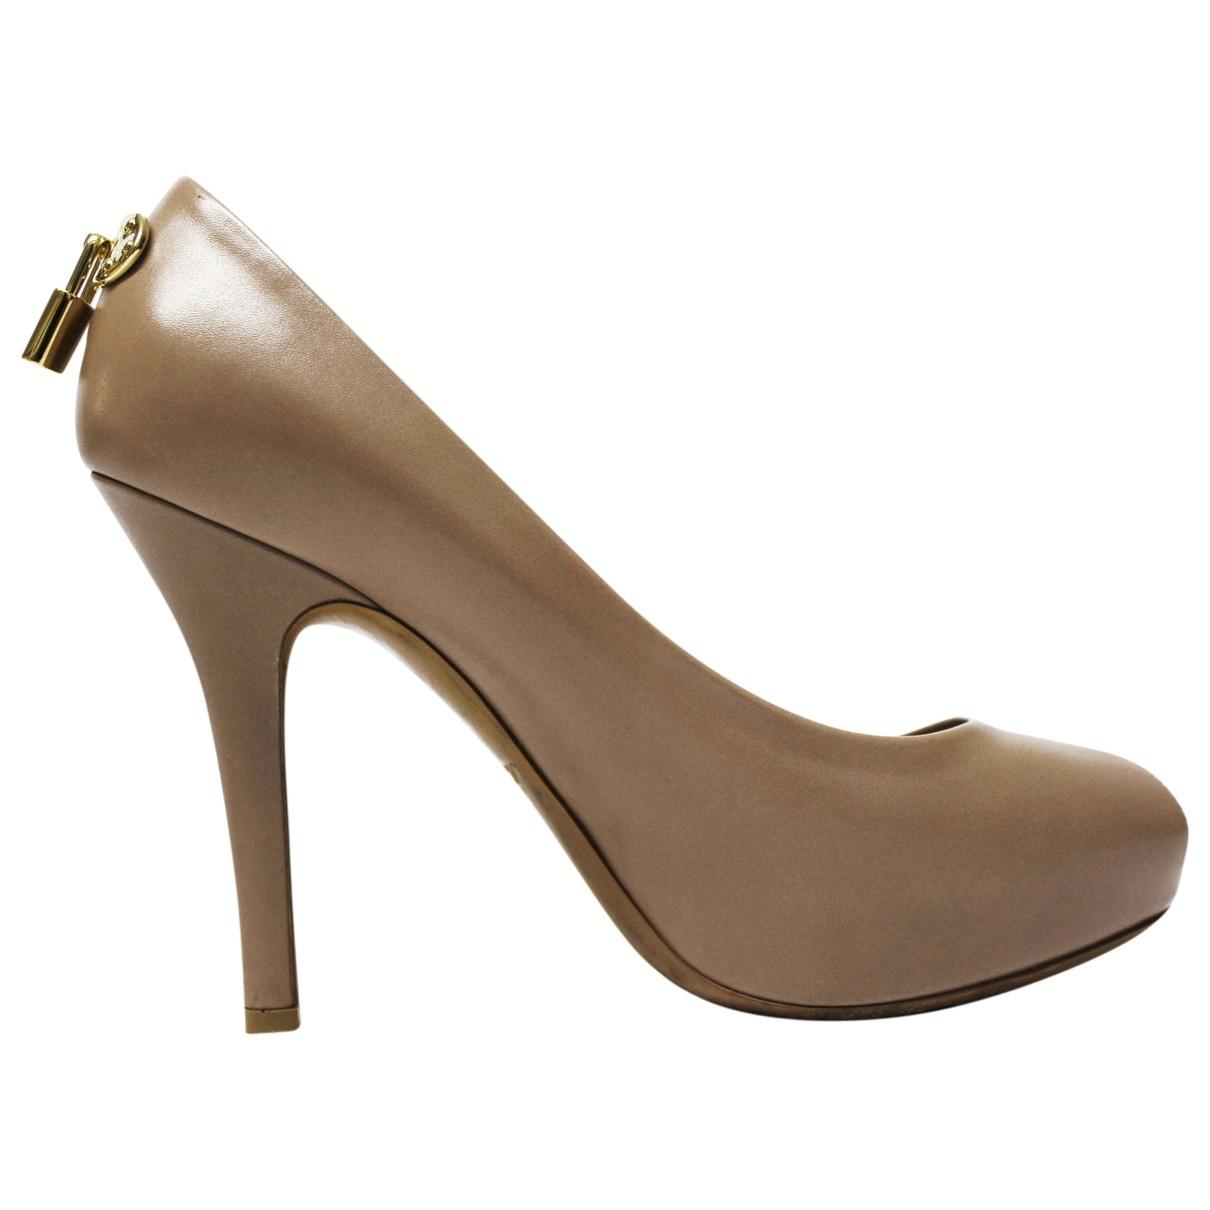 Louis Vuitton \N Leather Heels for Women 35 EU